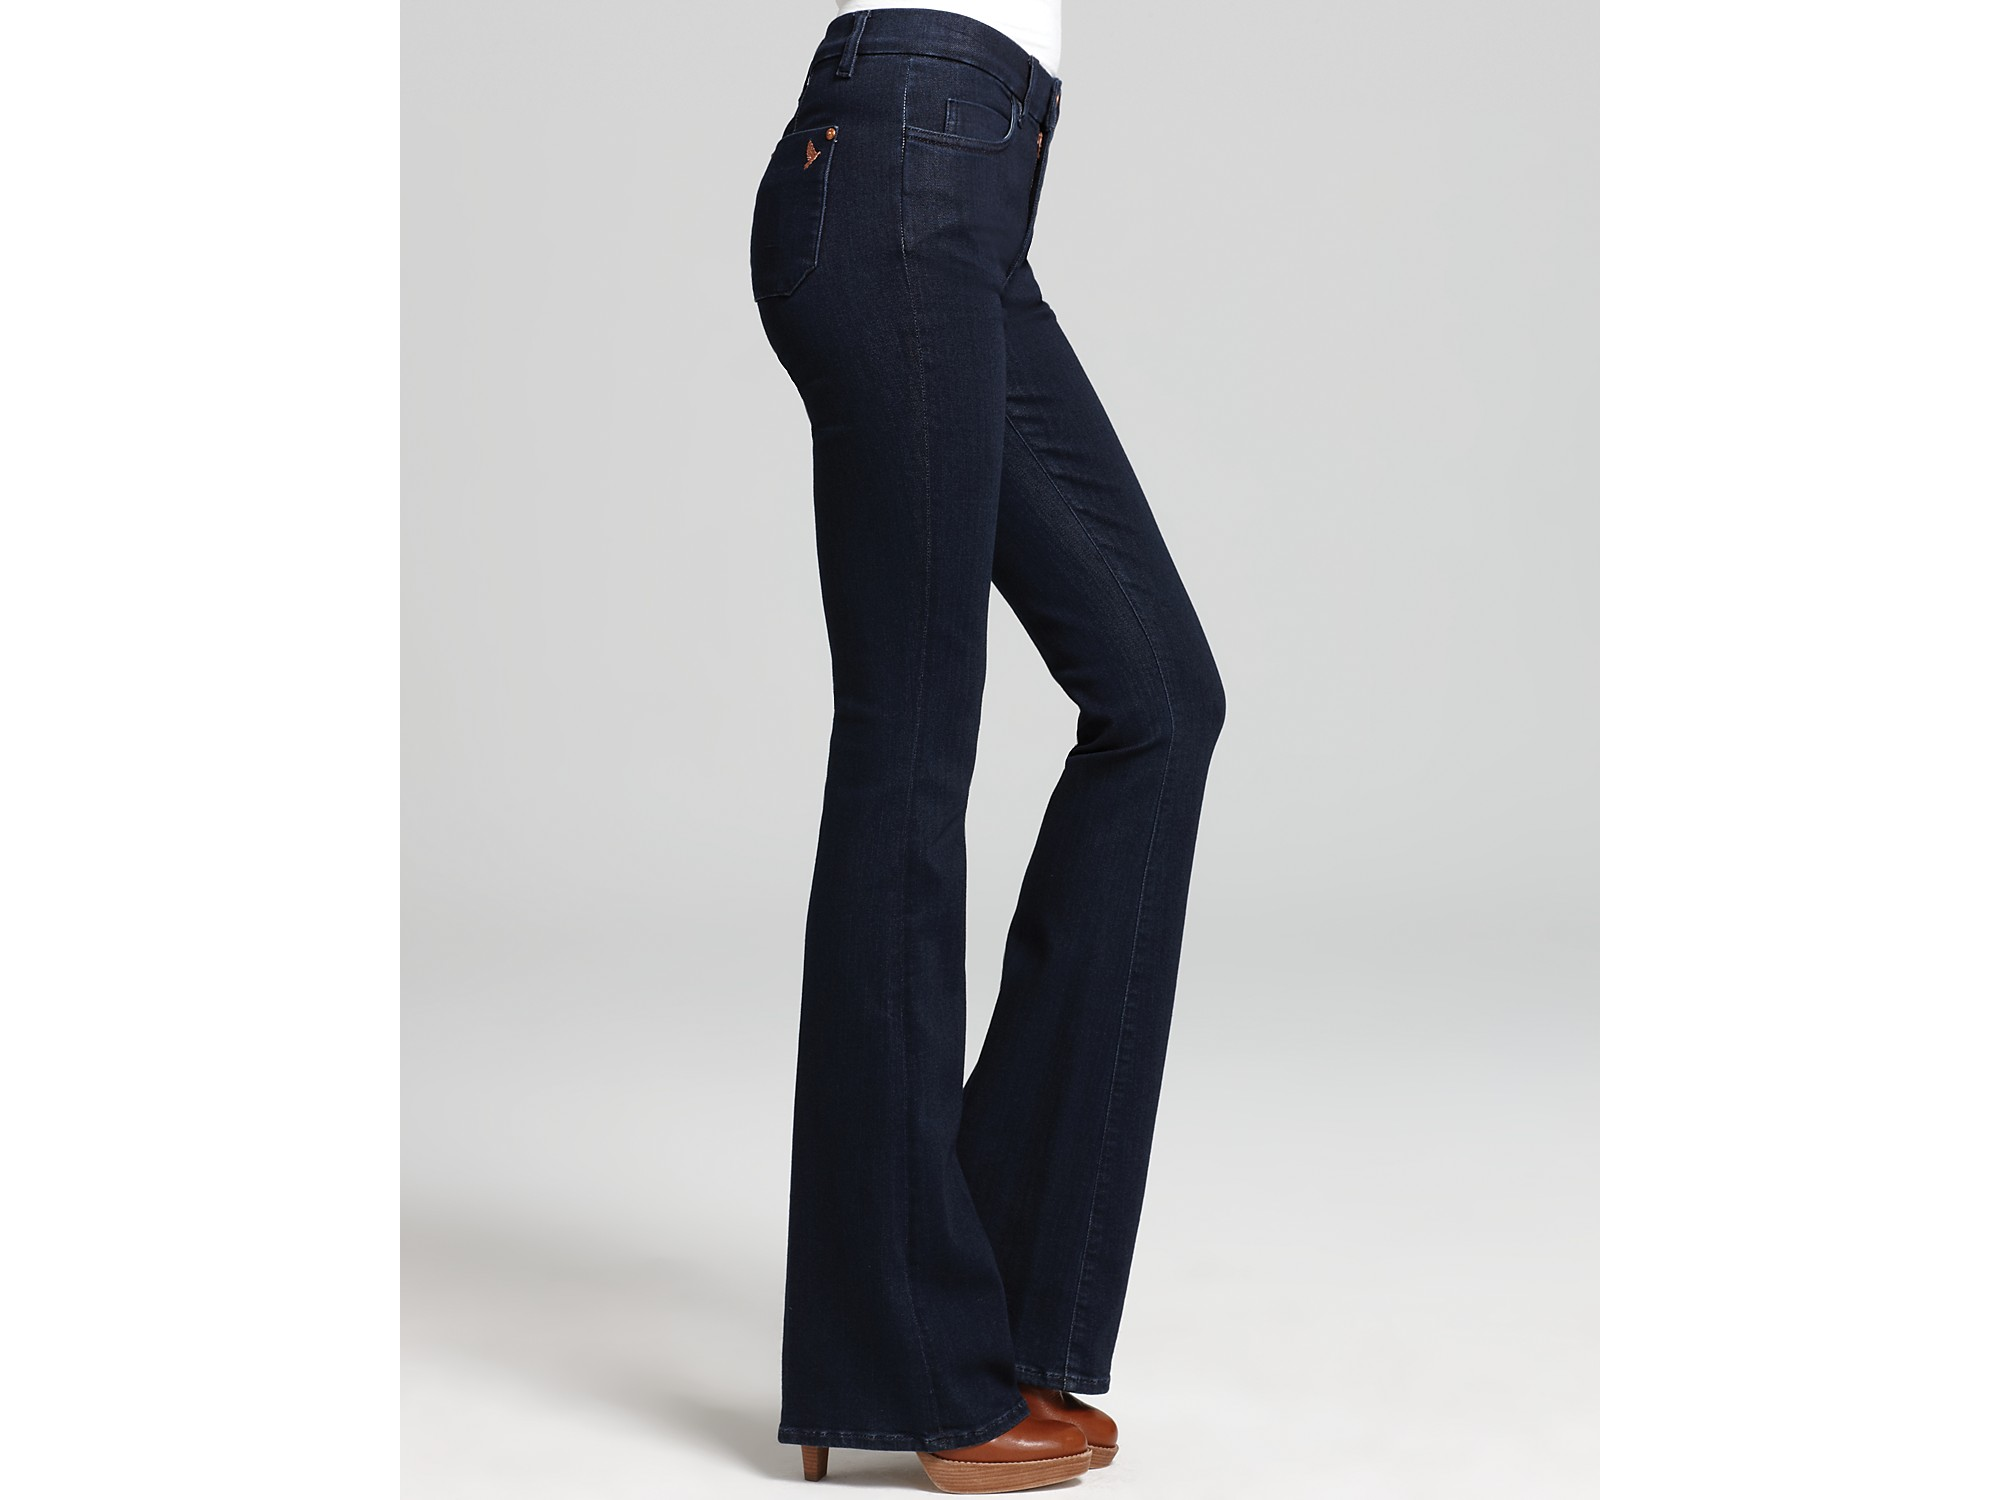 Ash Mih Jeans Skinny Marrakesh Mid Rise Flare Jeans in Joplin Wash ...